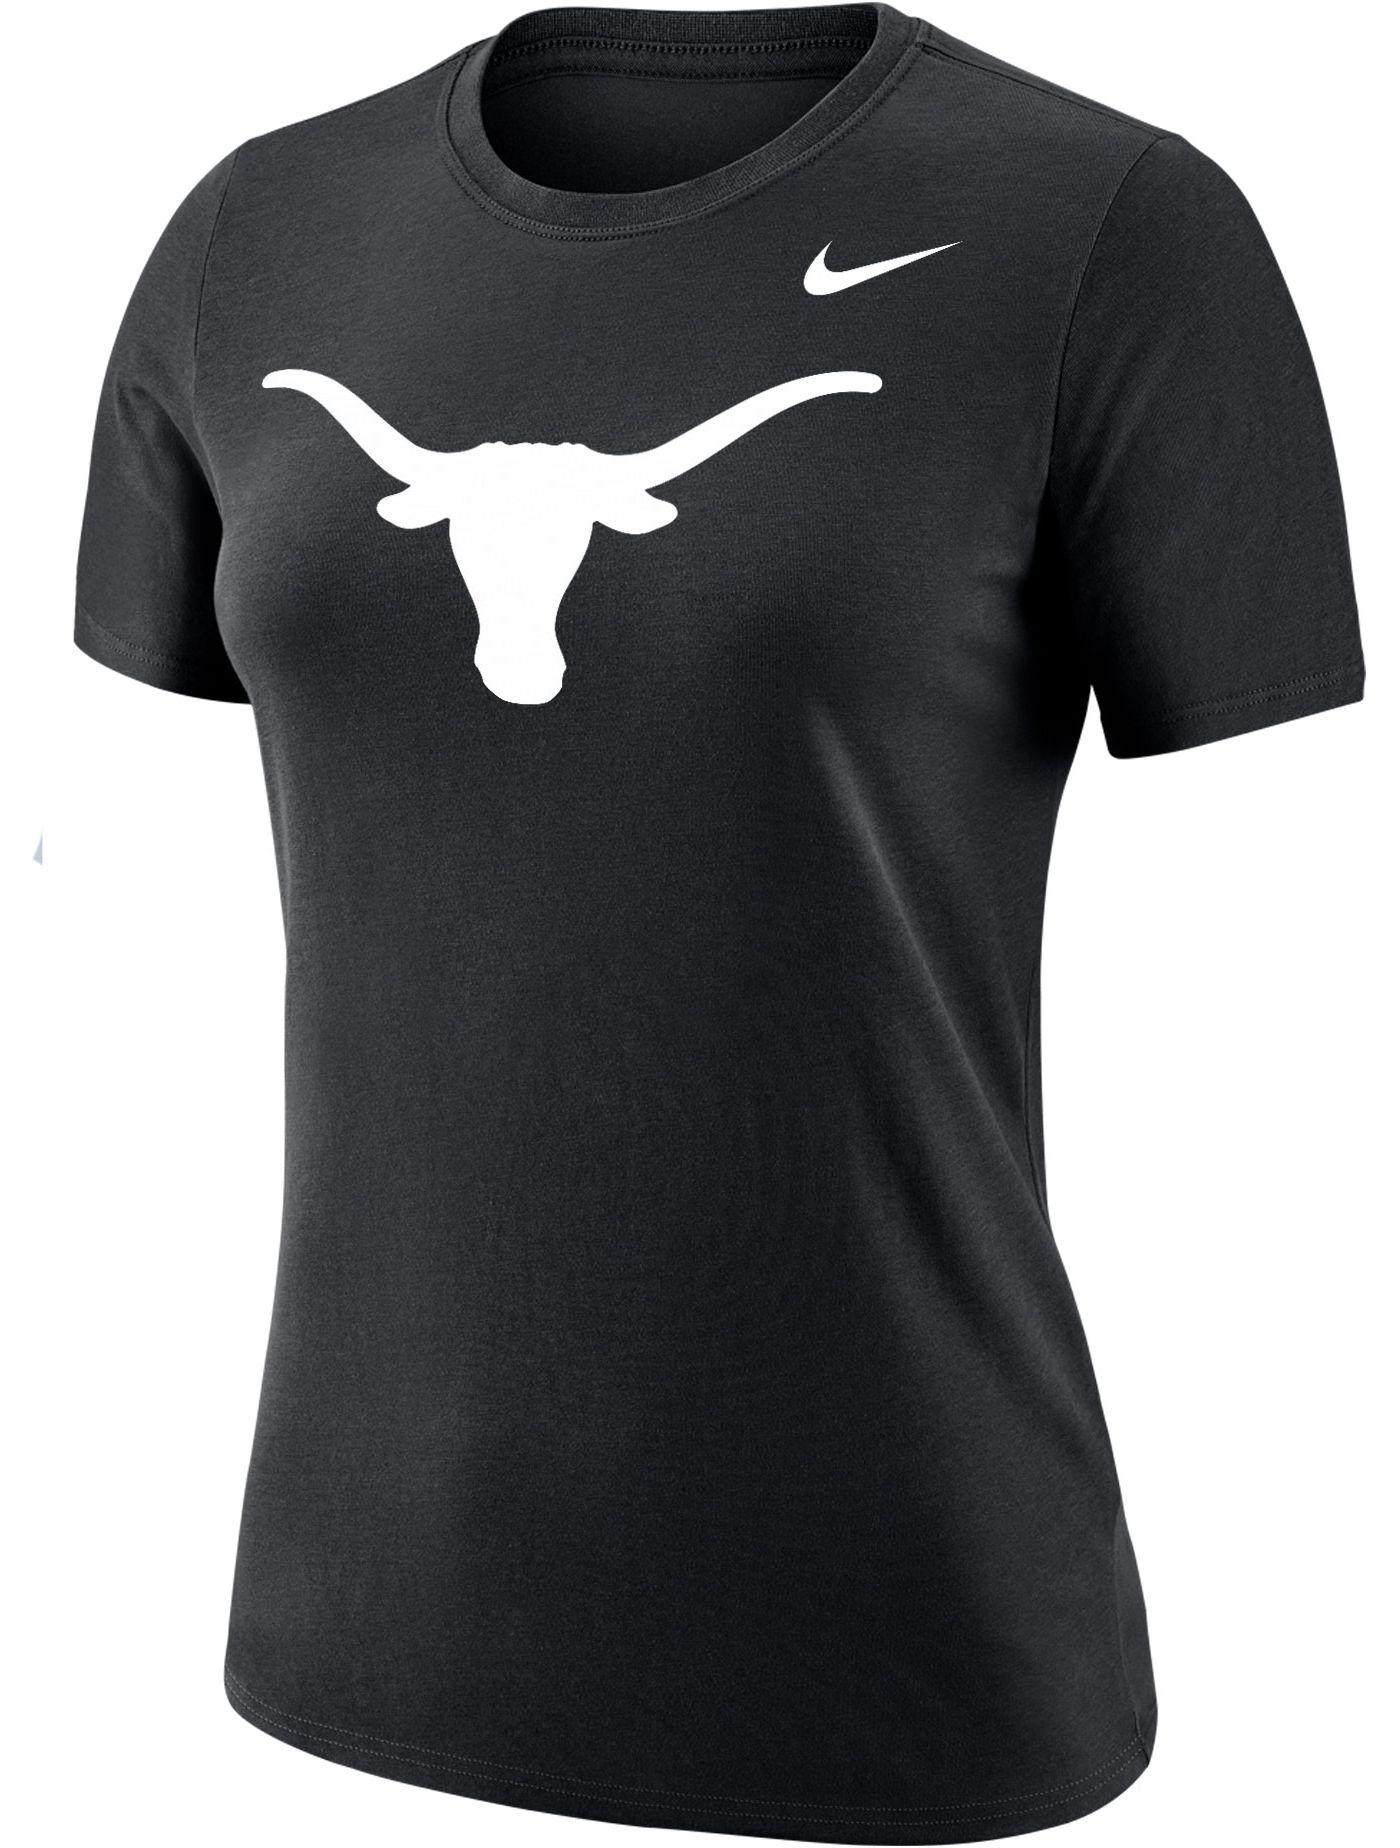 Nike Women's Texas Longhorns Dri-FIT Cotton Logo Black T-Shirt